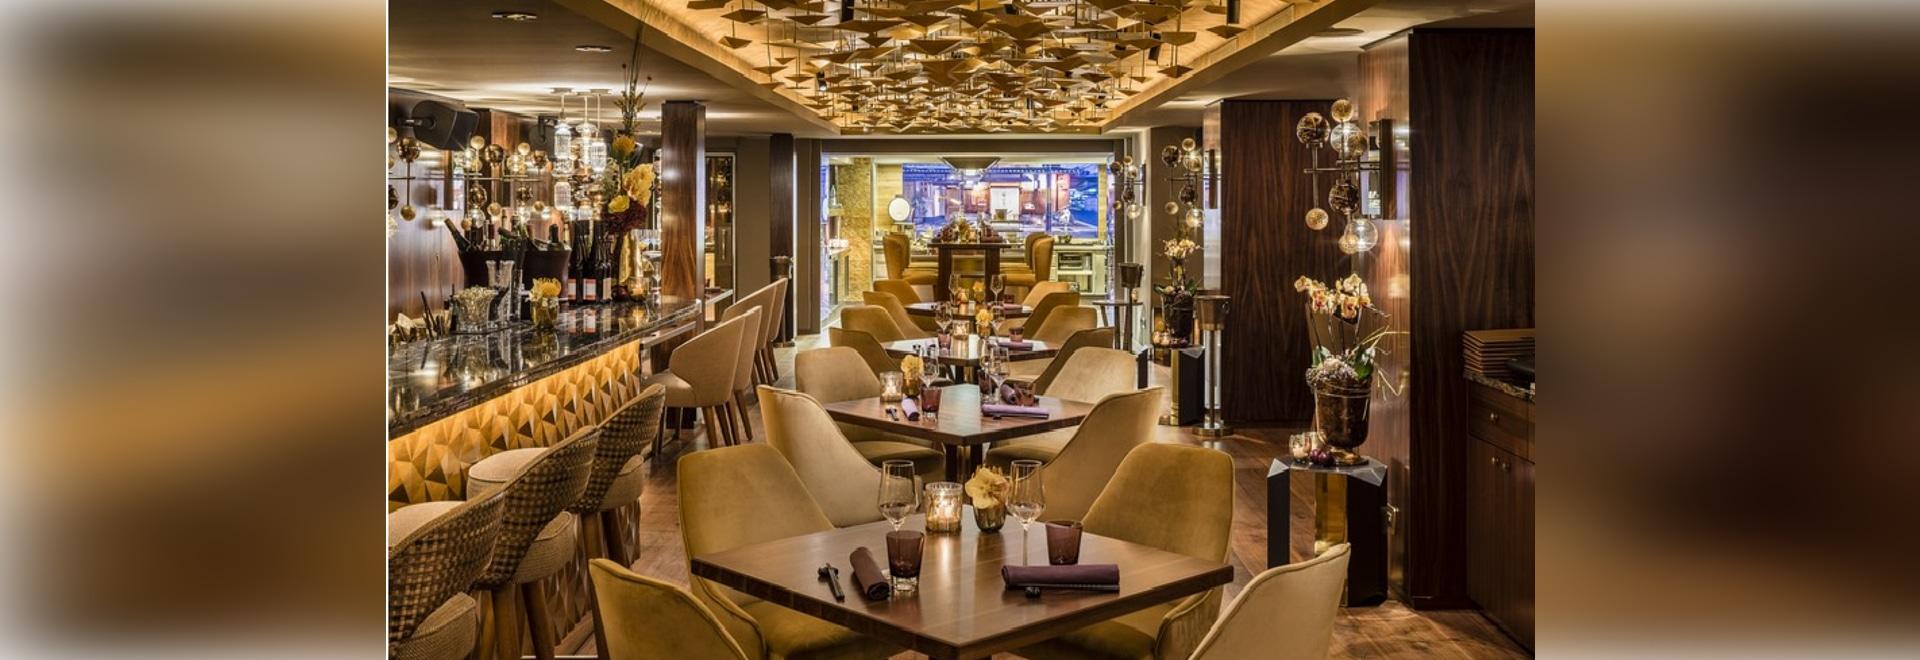 Hôtel Fairmount Vier Jahreszeiten - Restaurant Nikkei Nei